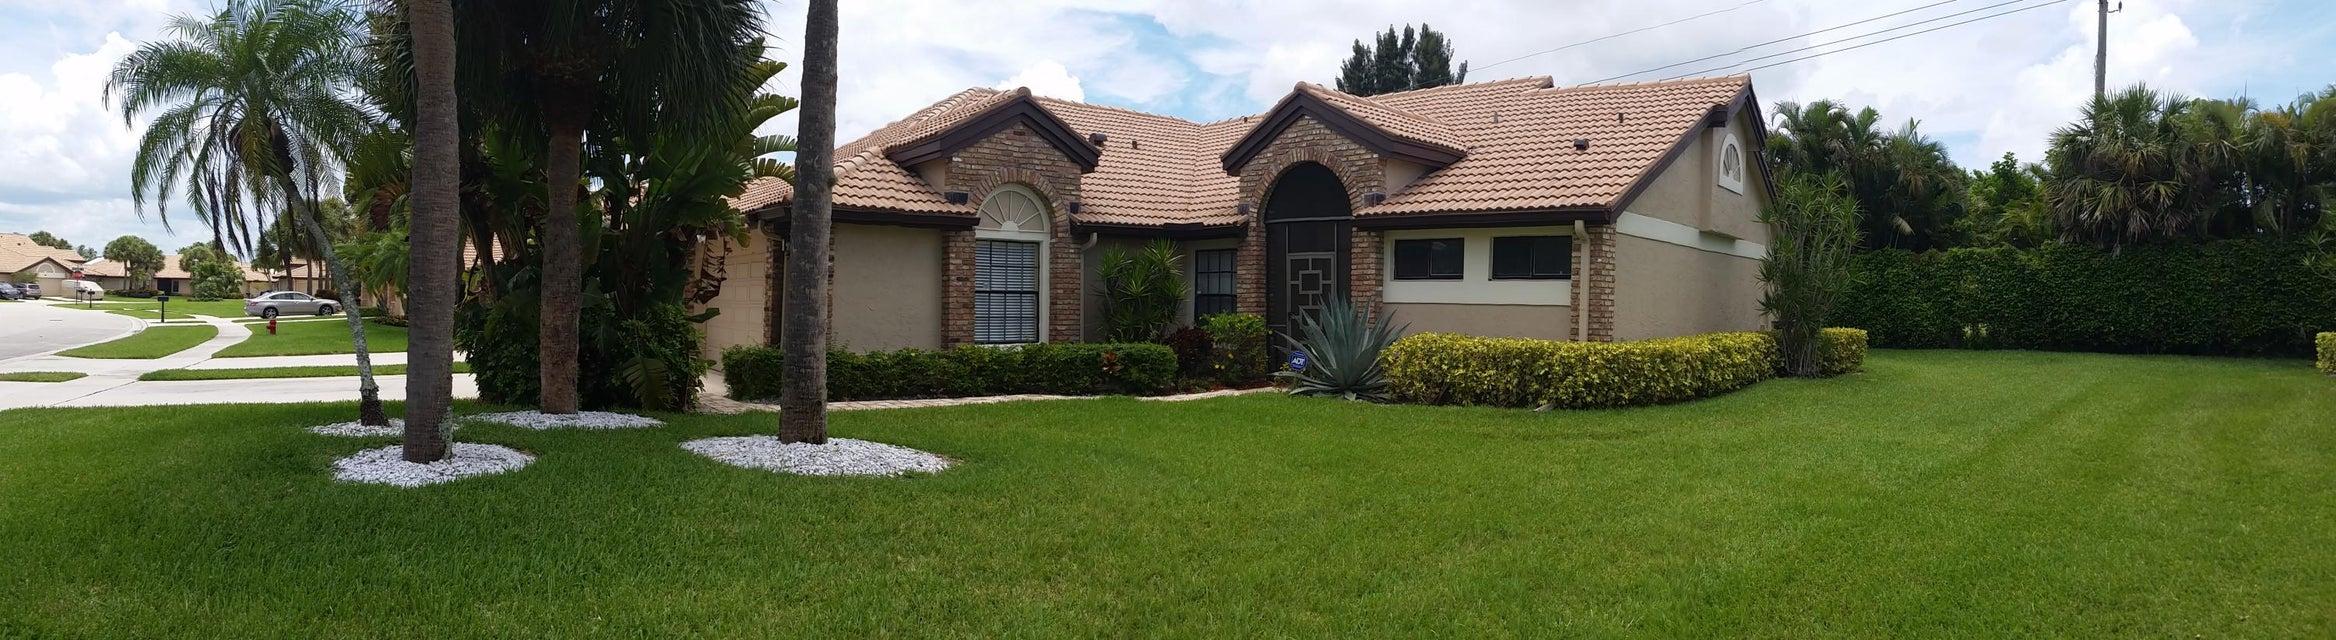 Villa por un Alquiler en 7399 Le Chalet Boulevard 7399 Le Chalet Boulevard Boynton Beach, Florida 33472 Estados Unidos